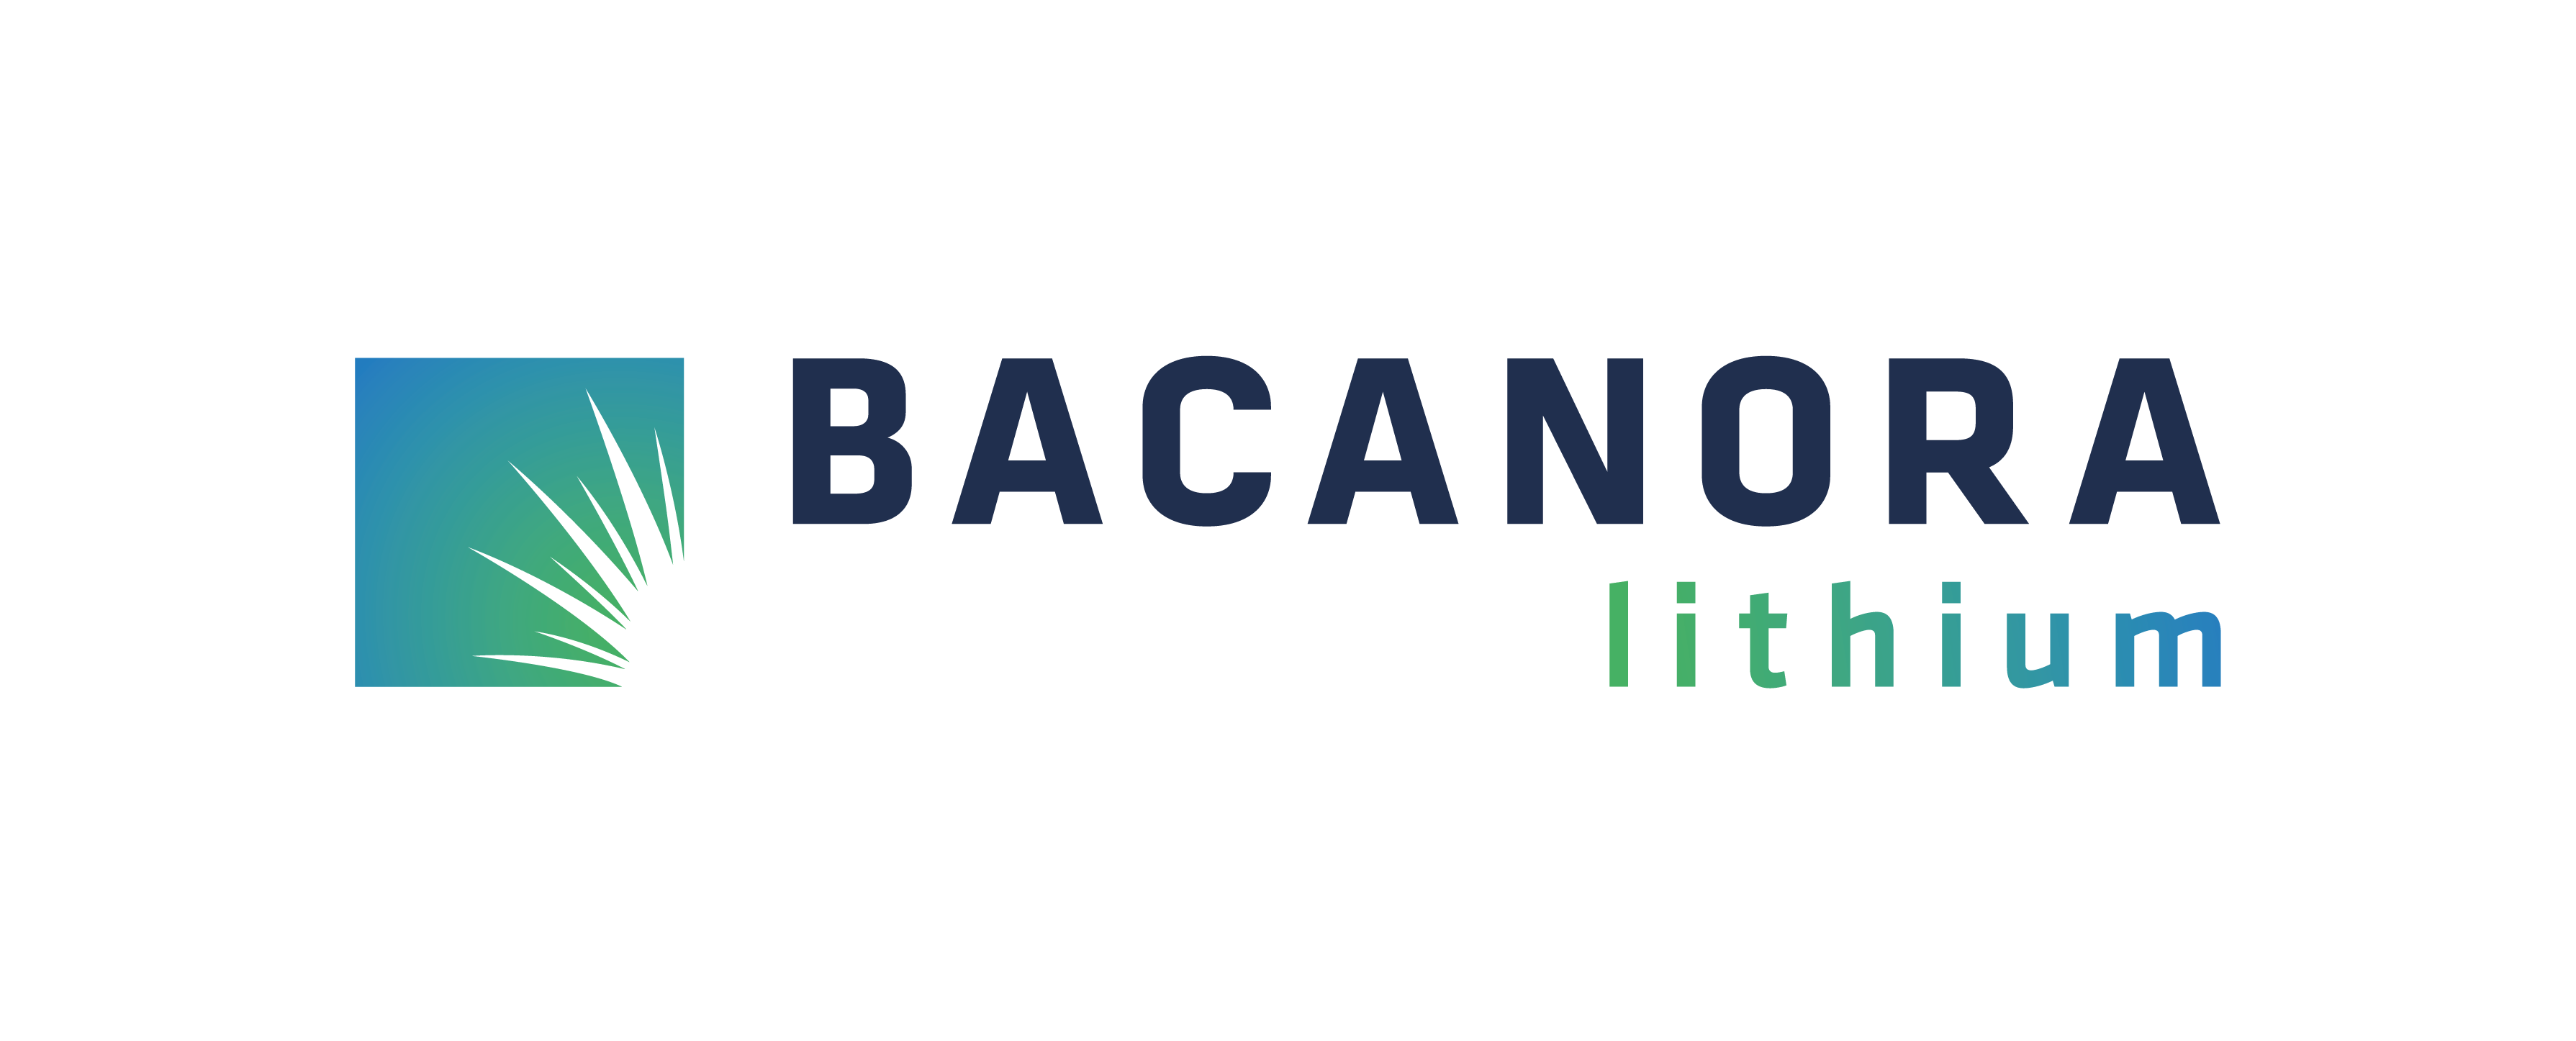 BACANORA LITHIUM PLC Logo